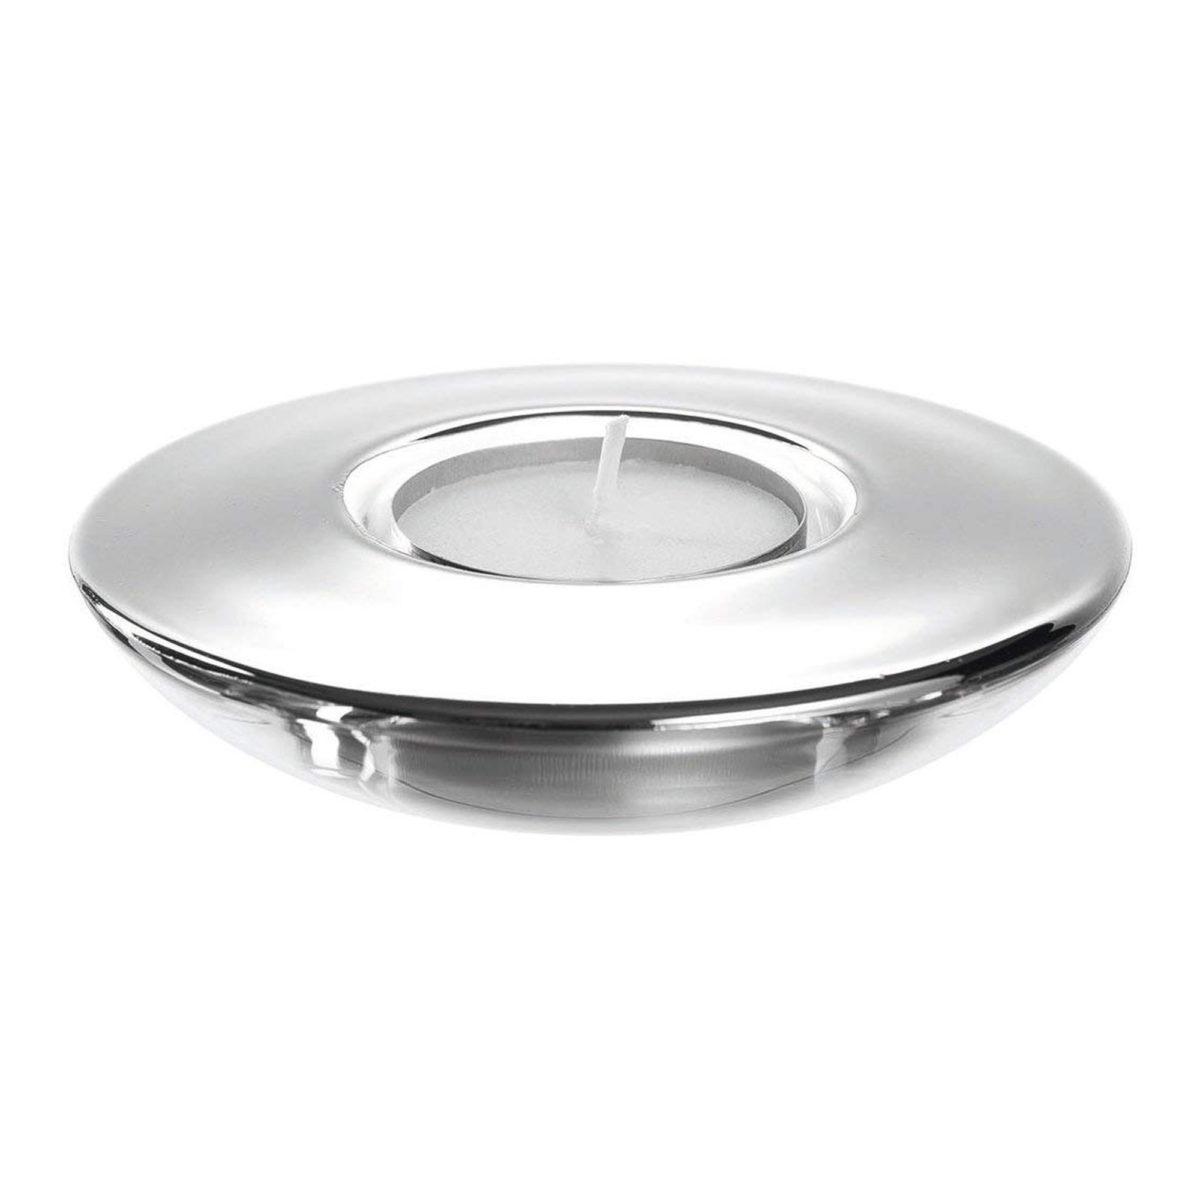 4002541315717 1200x1200 - Suport pentru lumânare Dino silver (L031571)